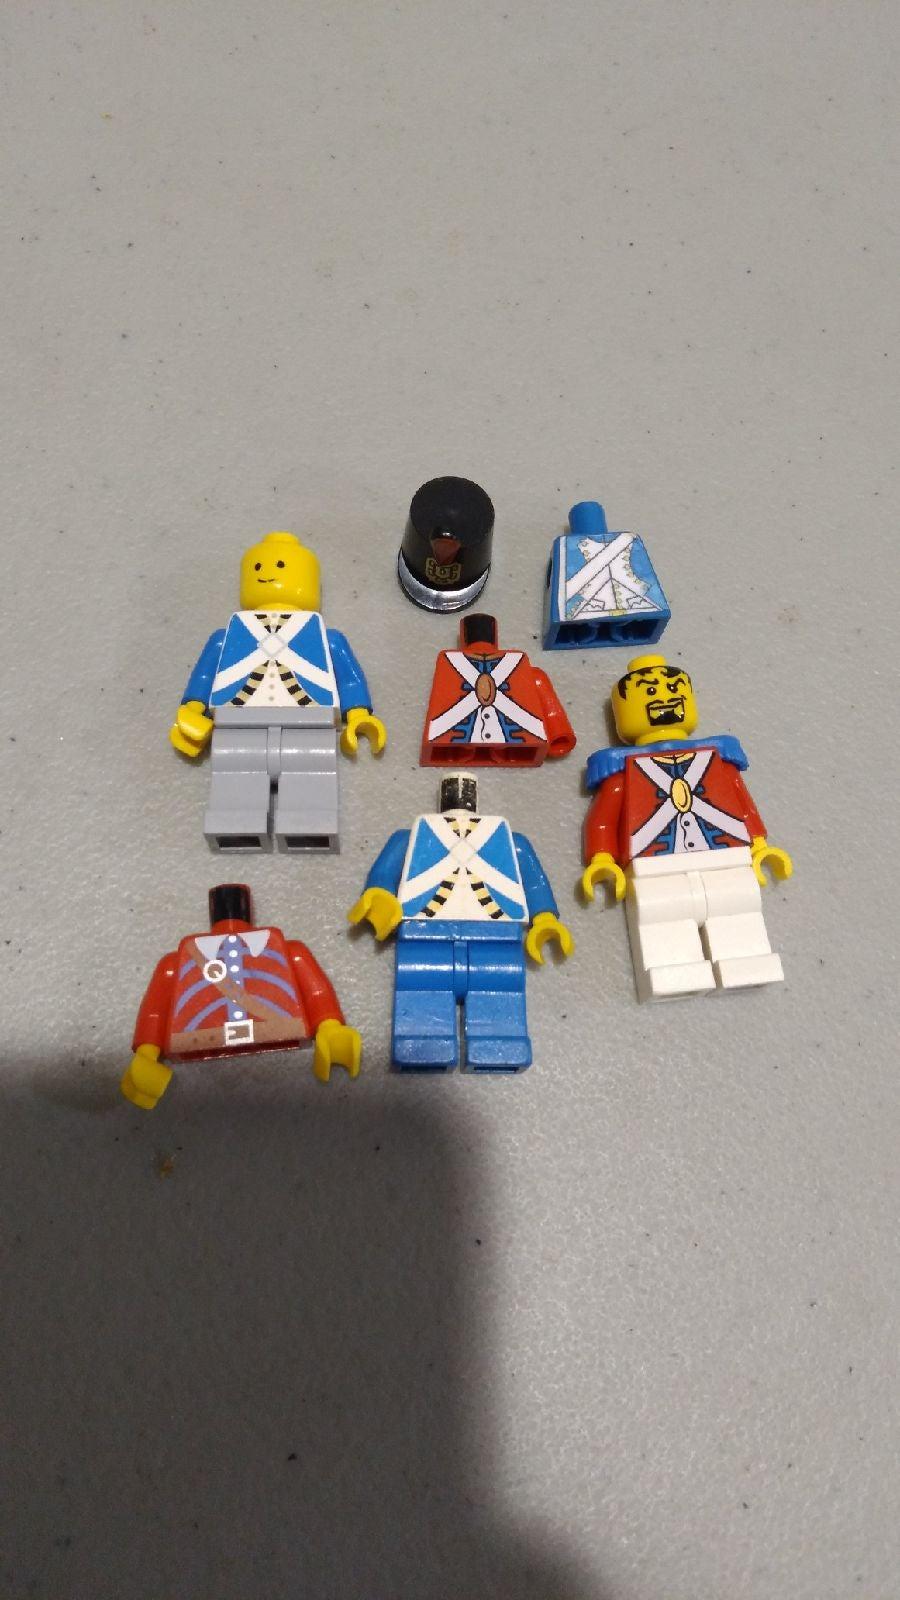 Lego Old War Minifigures (4)